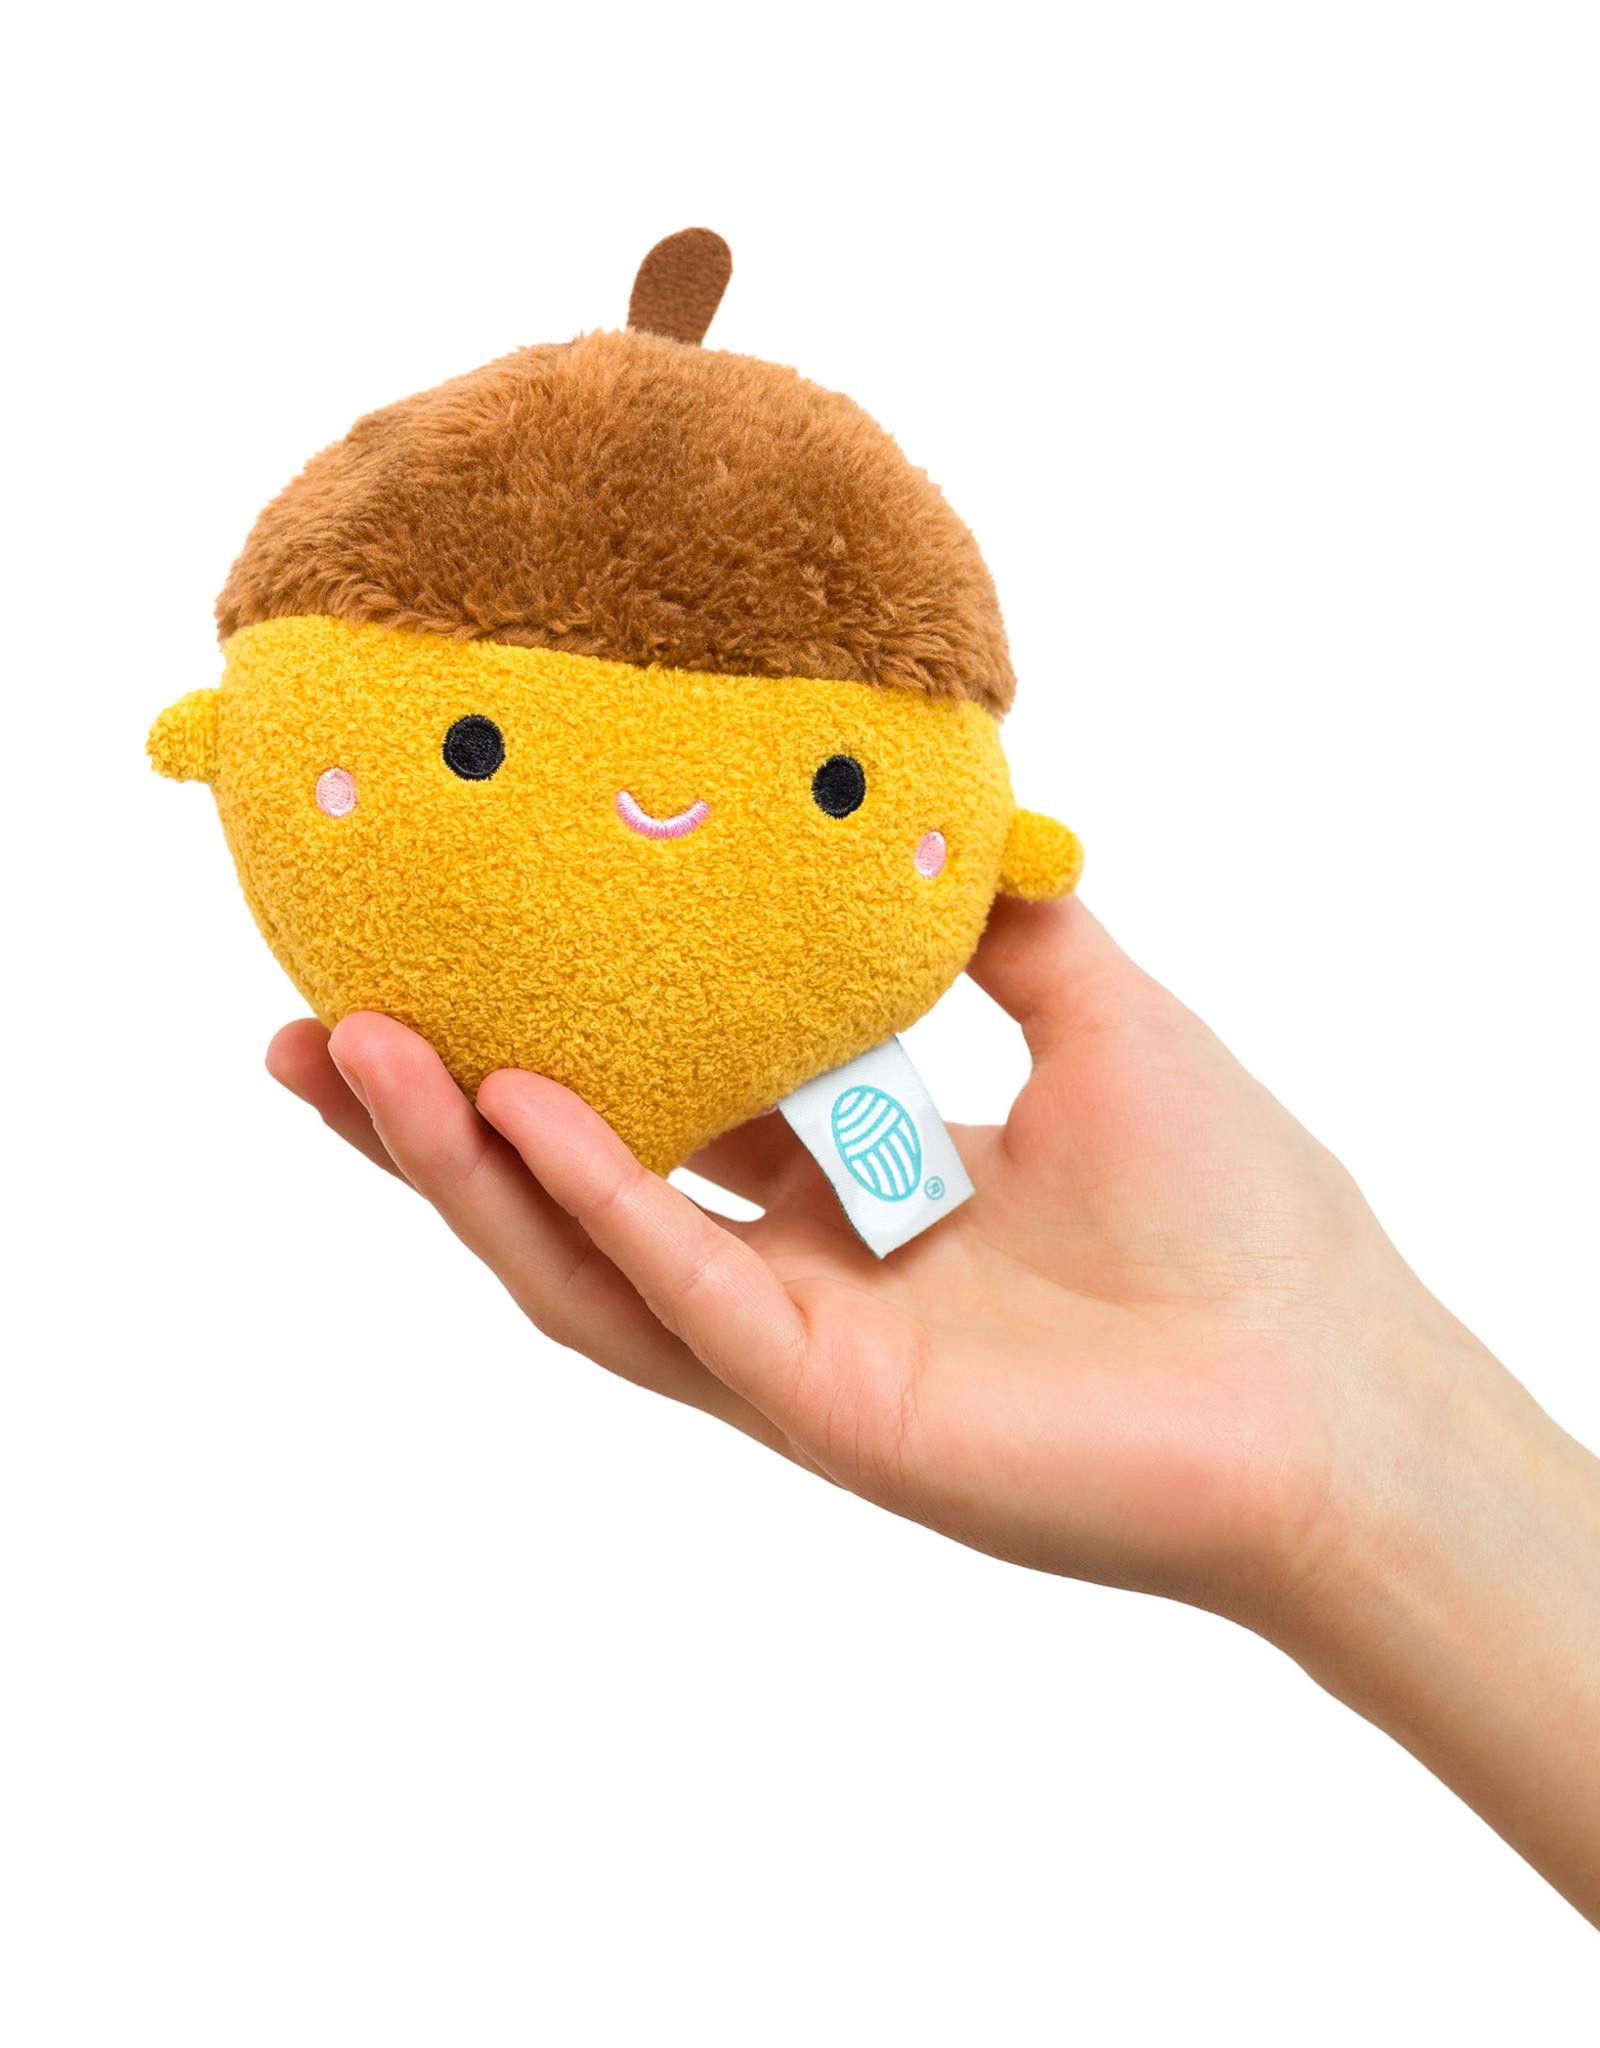 Noodoll Mini peluche - Petite noix